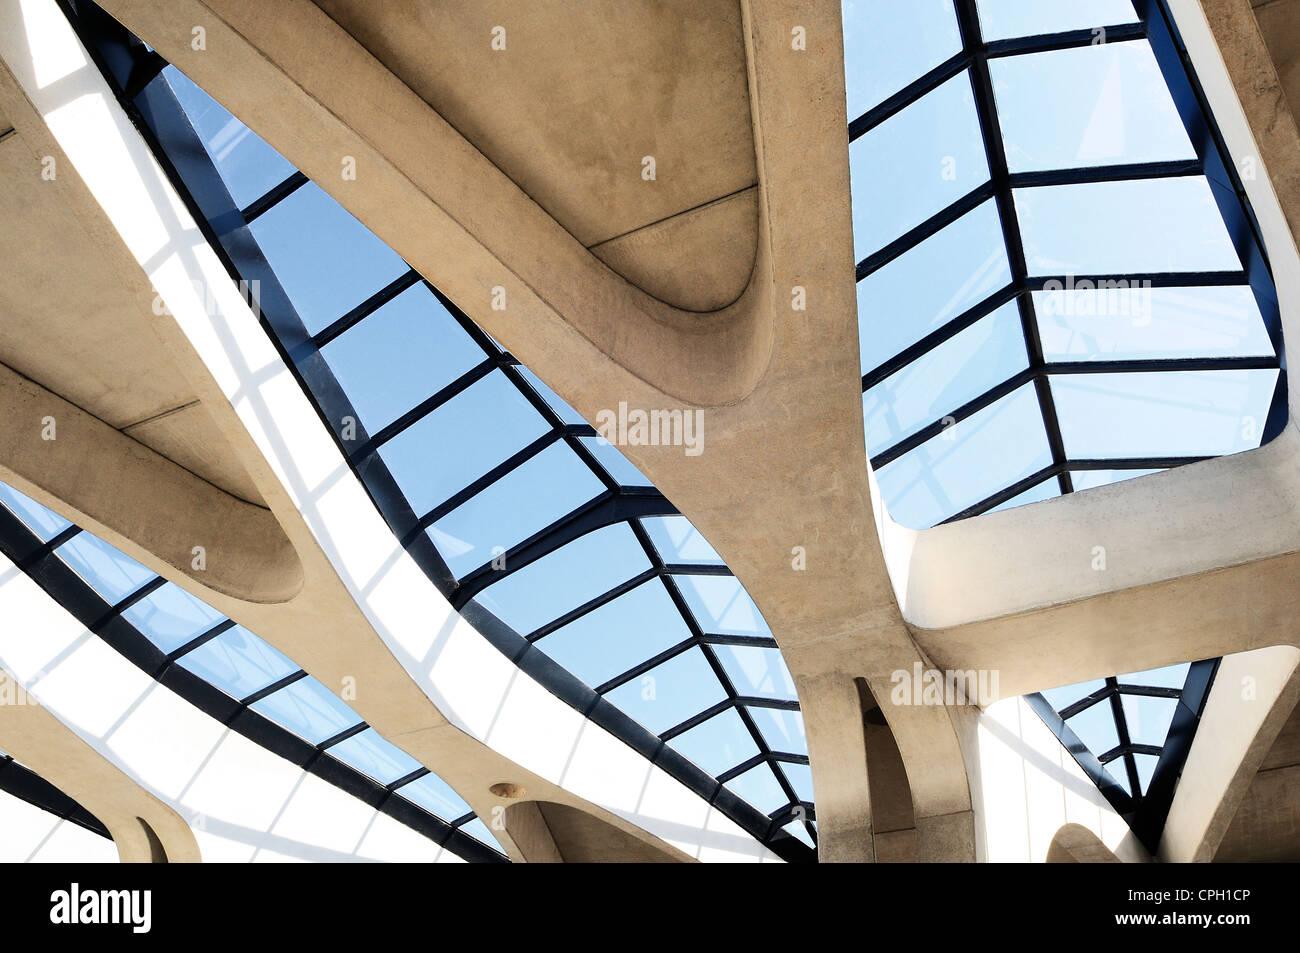 Techo, detalles de arquitectura contemporánea Foto de stock